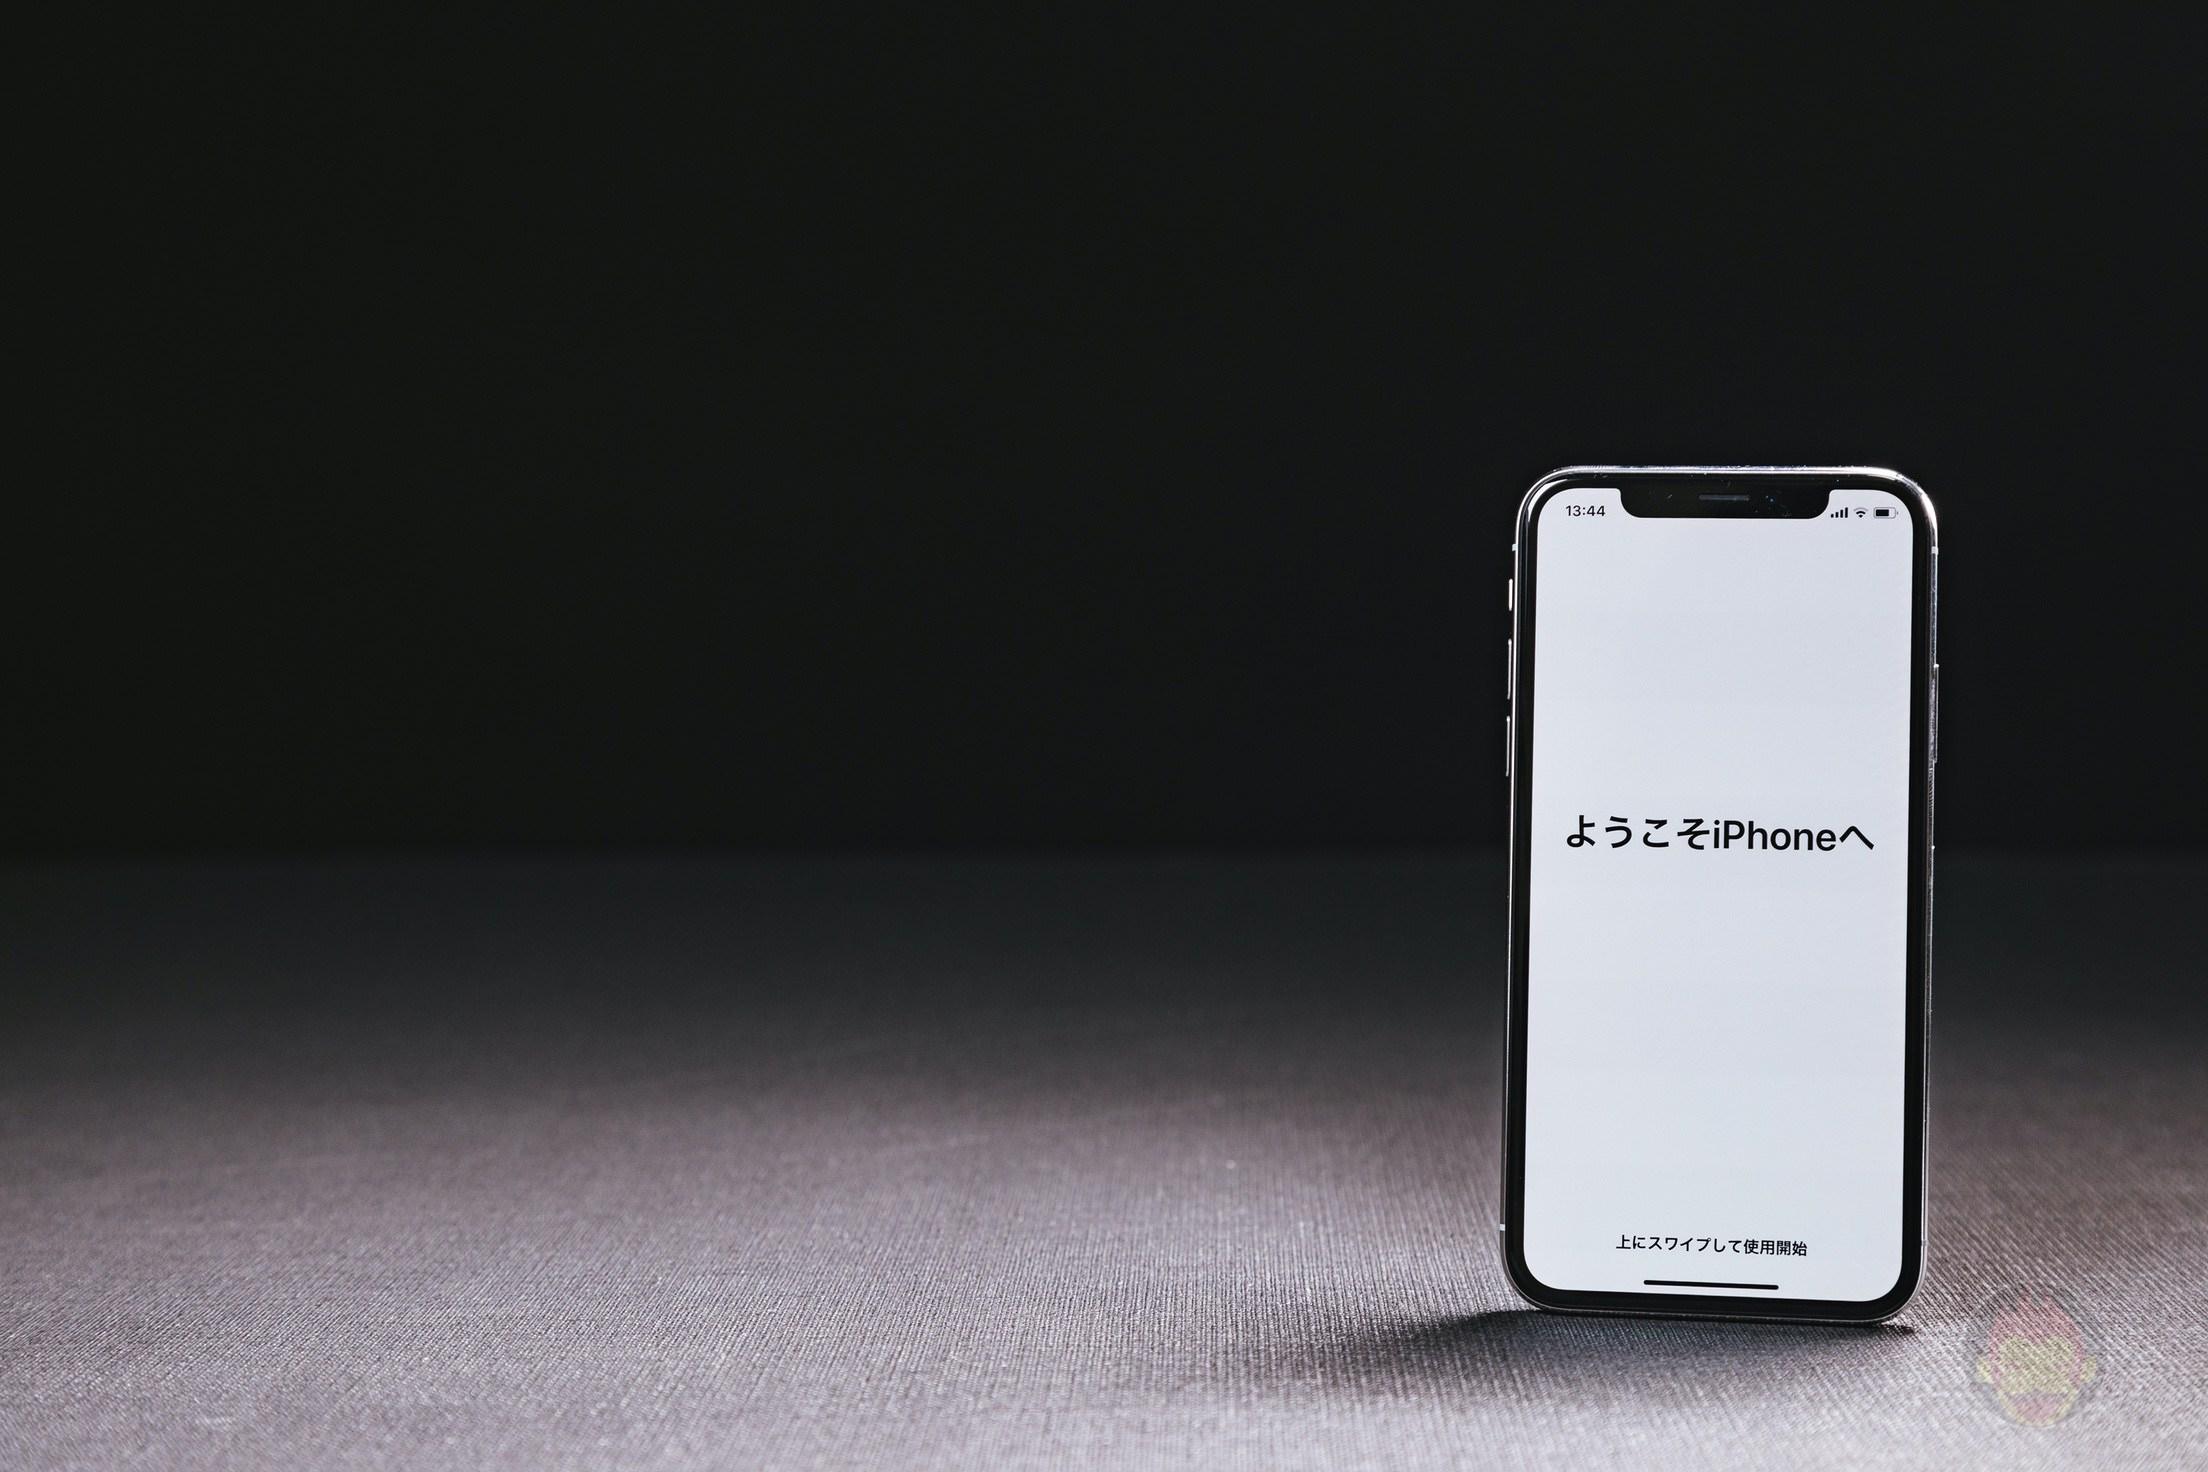 Welcome-to-iPhoneX-03.jpg